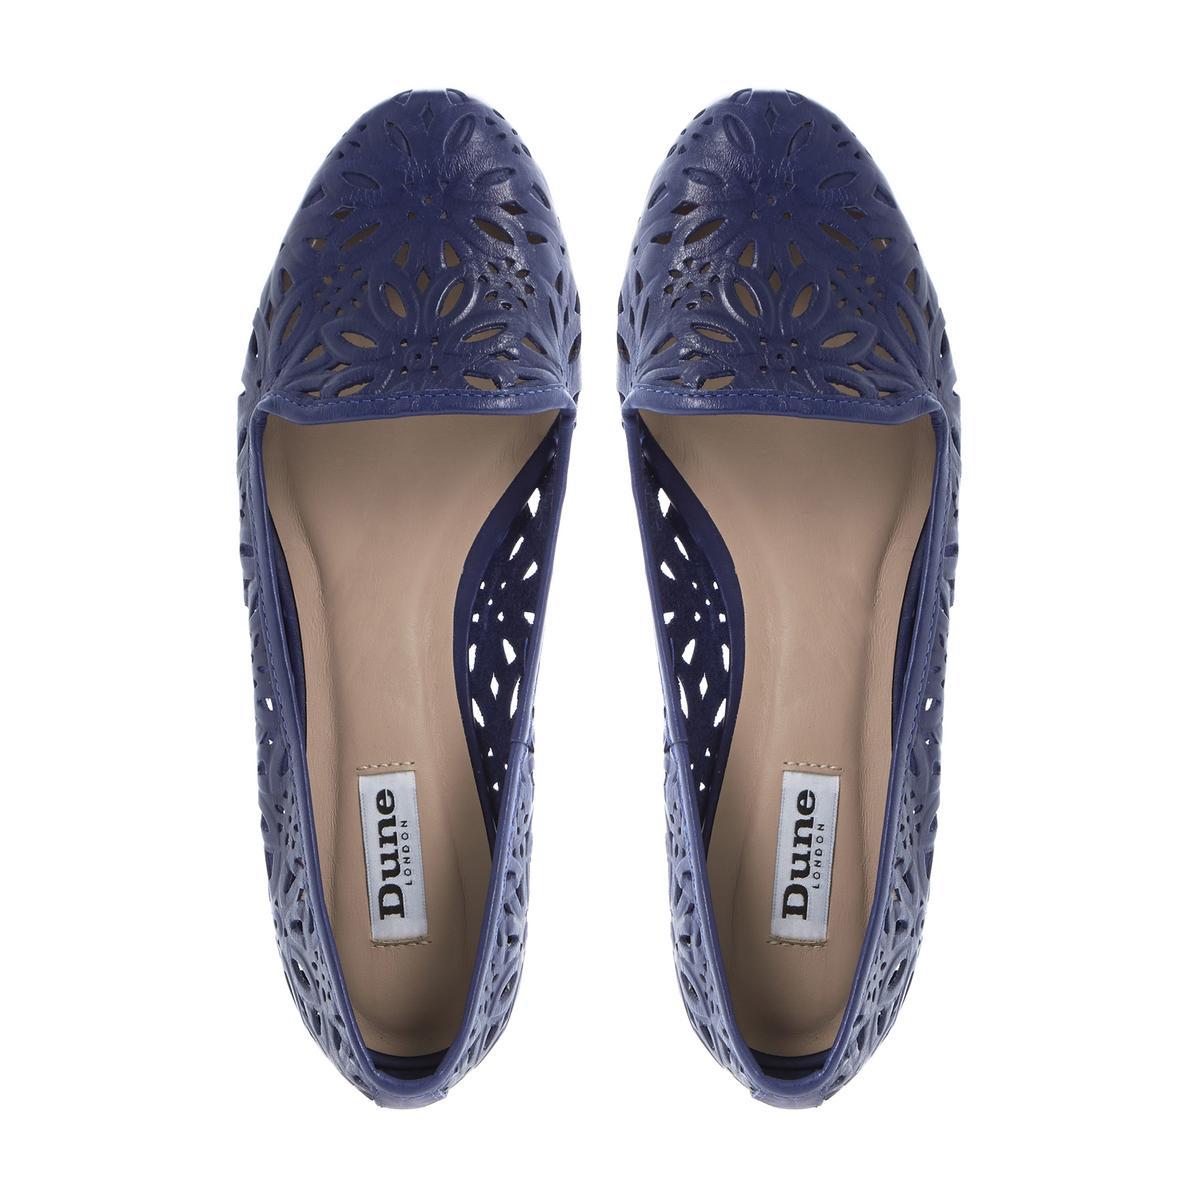 Navy Blue Flat Shoes Ladies